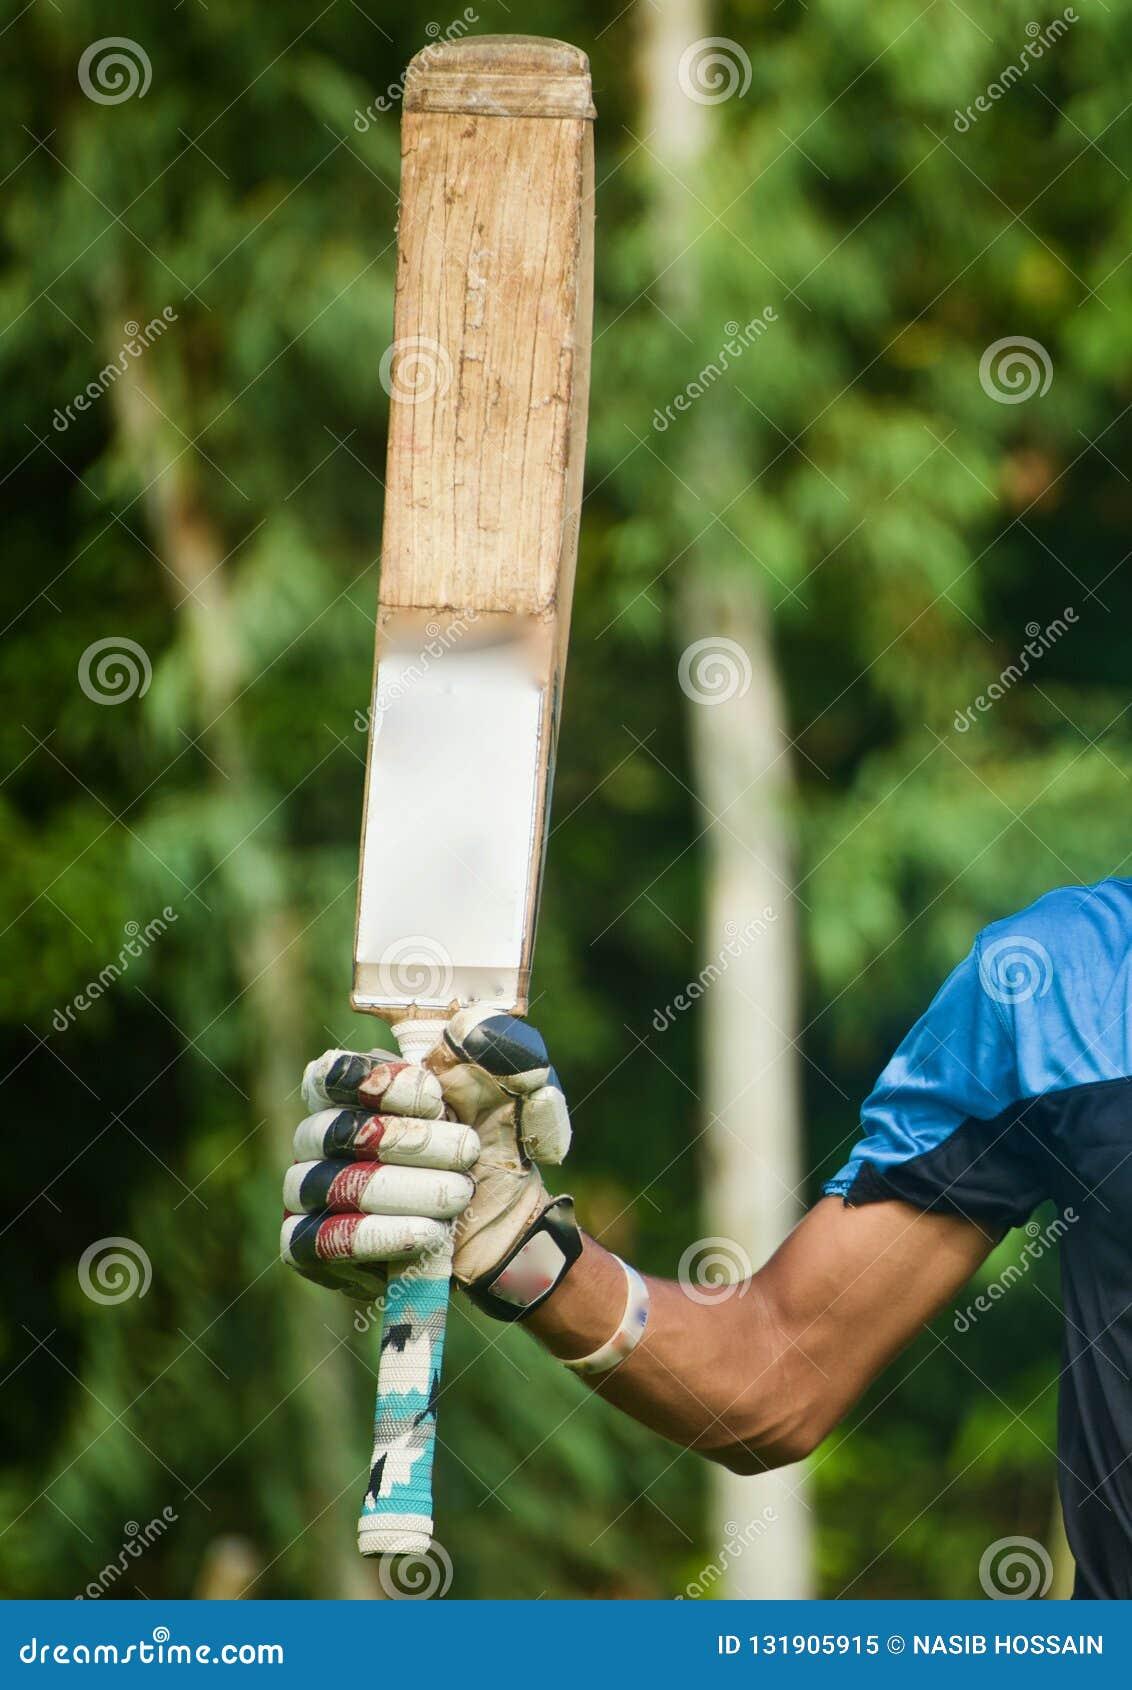 Batsman raising his bat after scoring a century